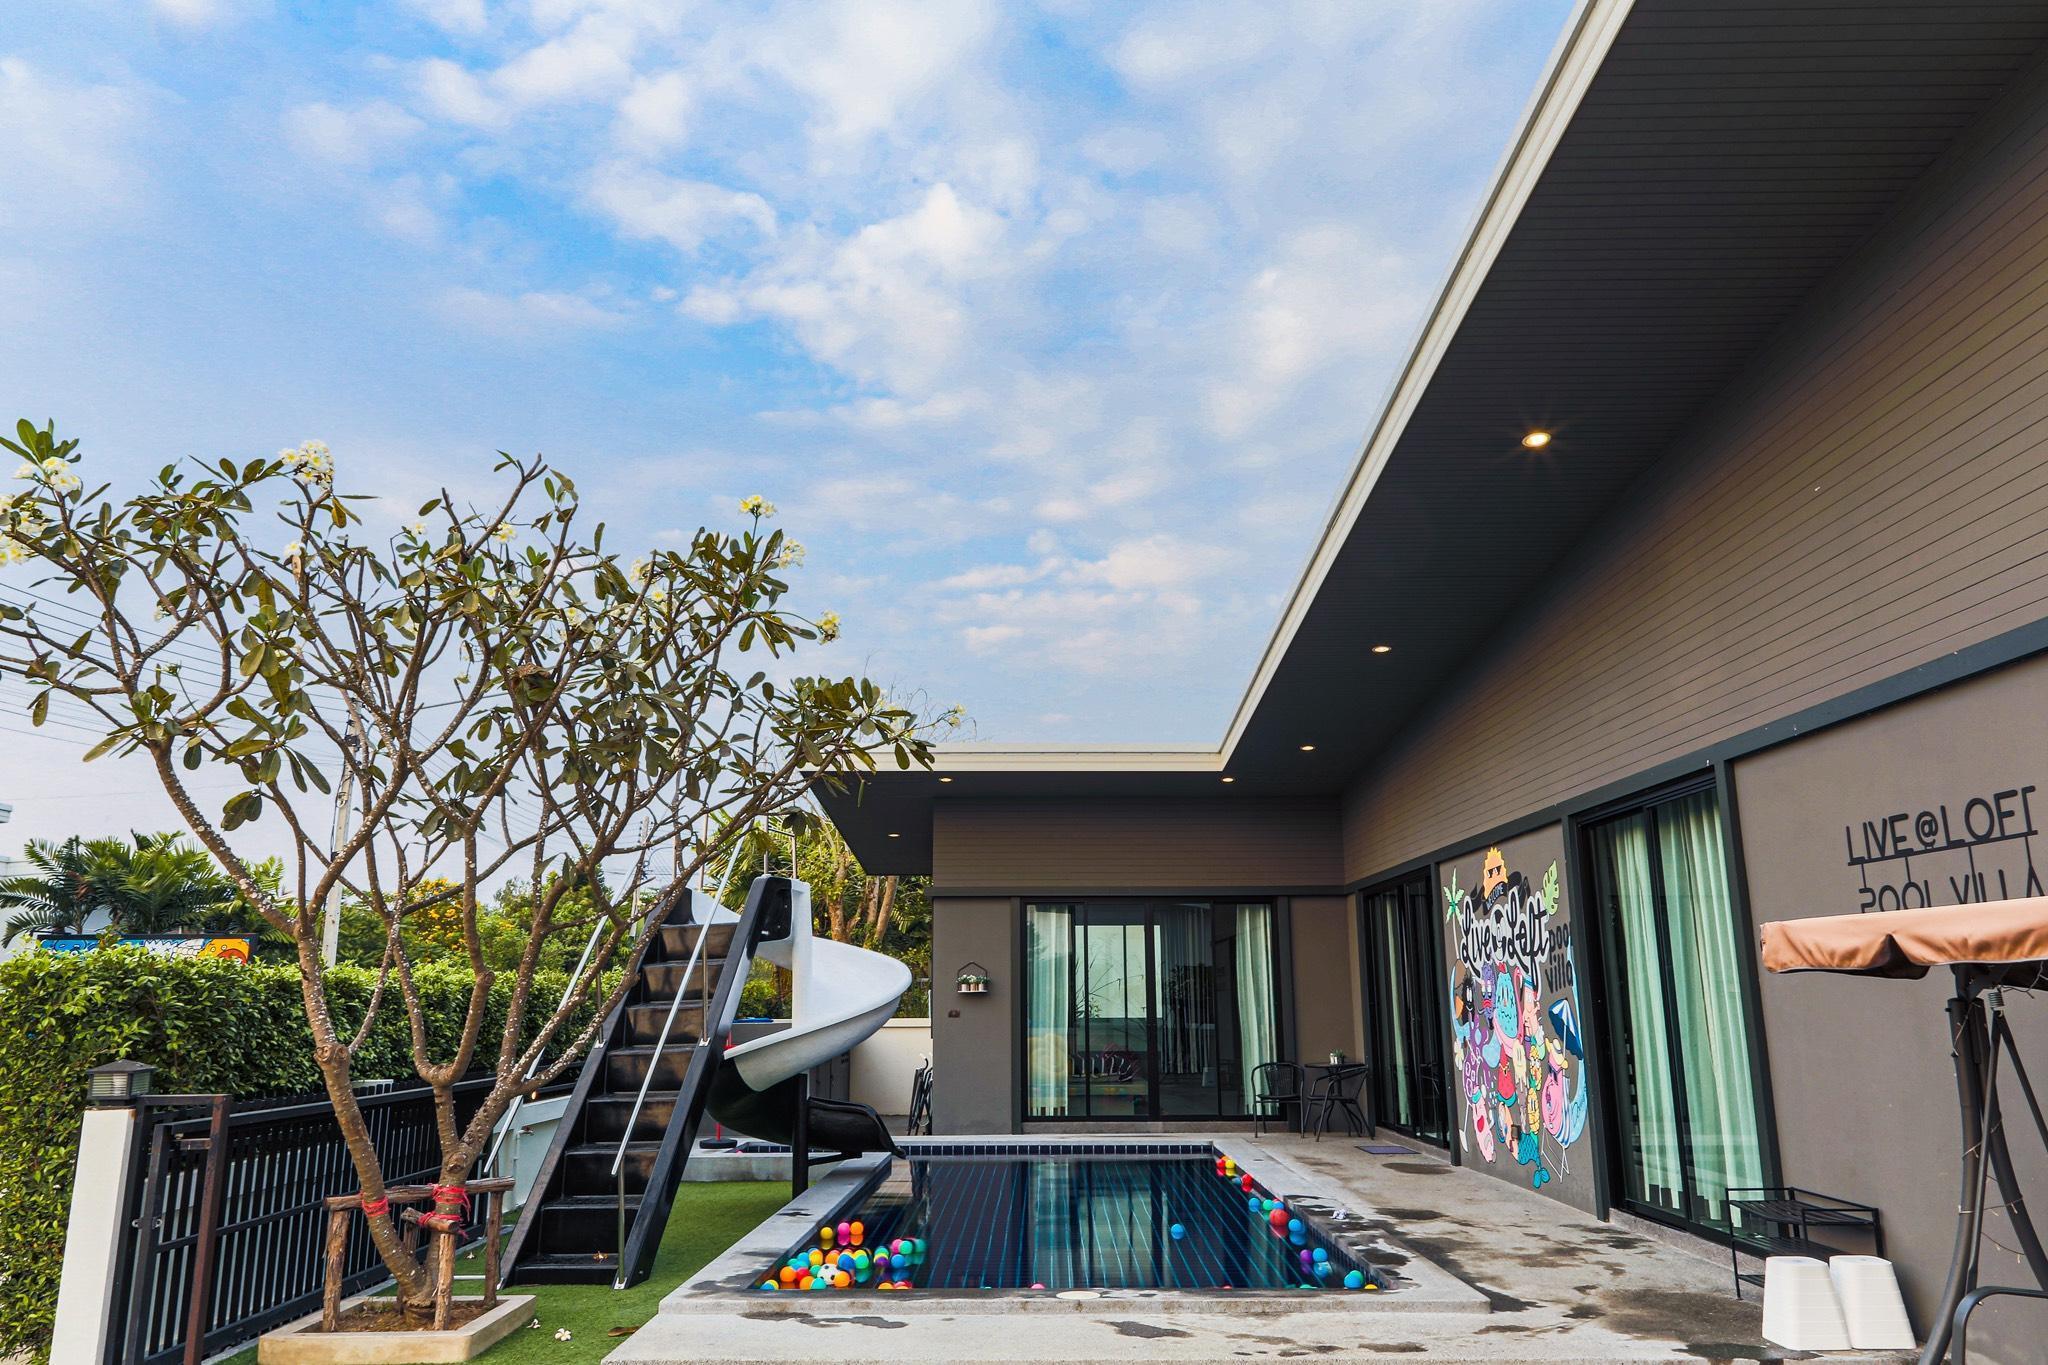 Live @ Loft Pool Villa Huahin